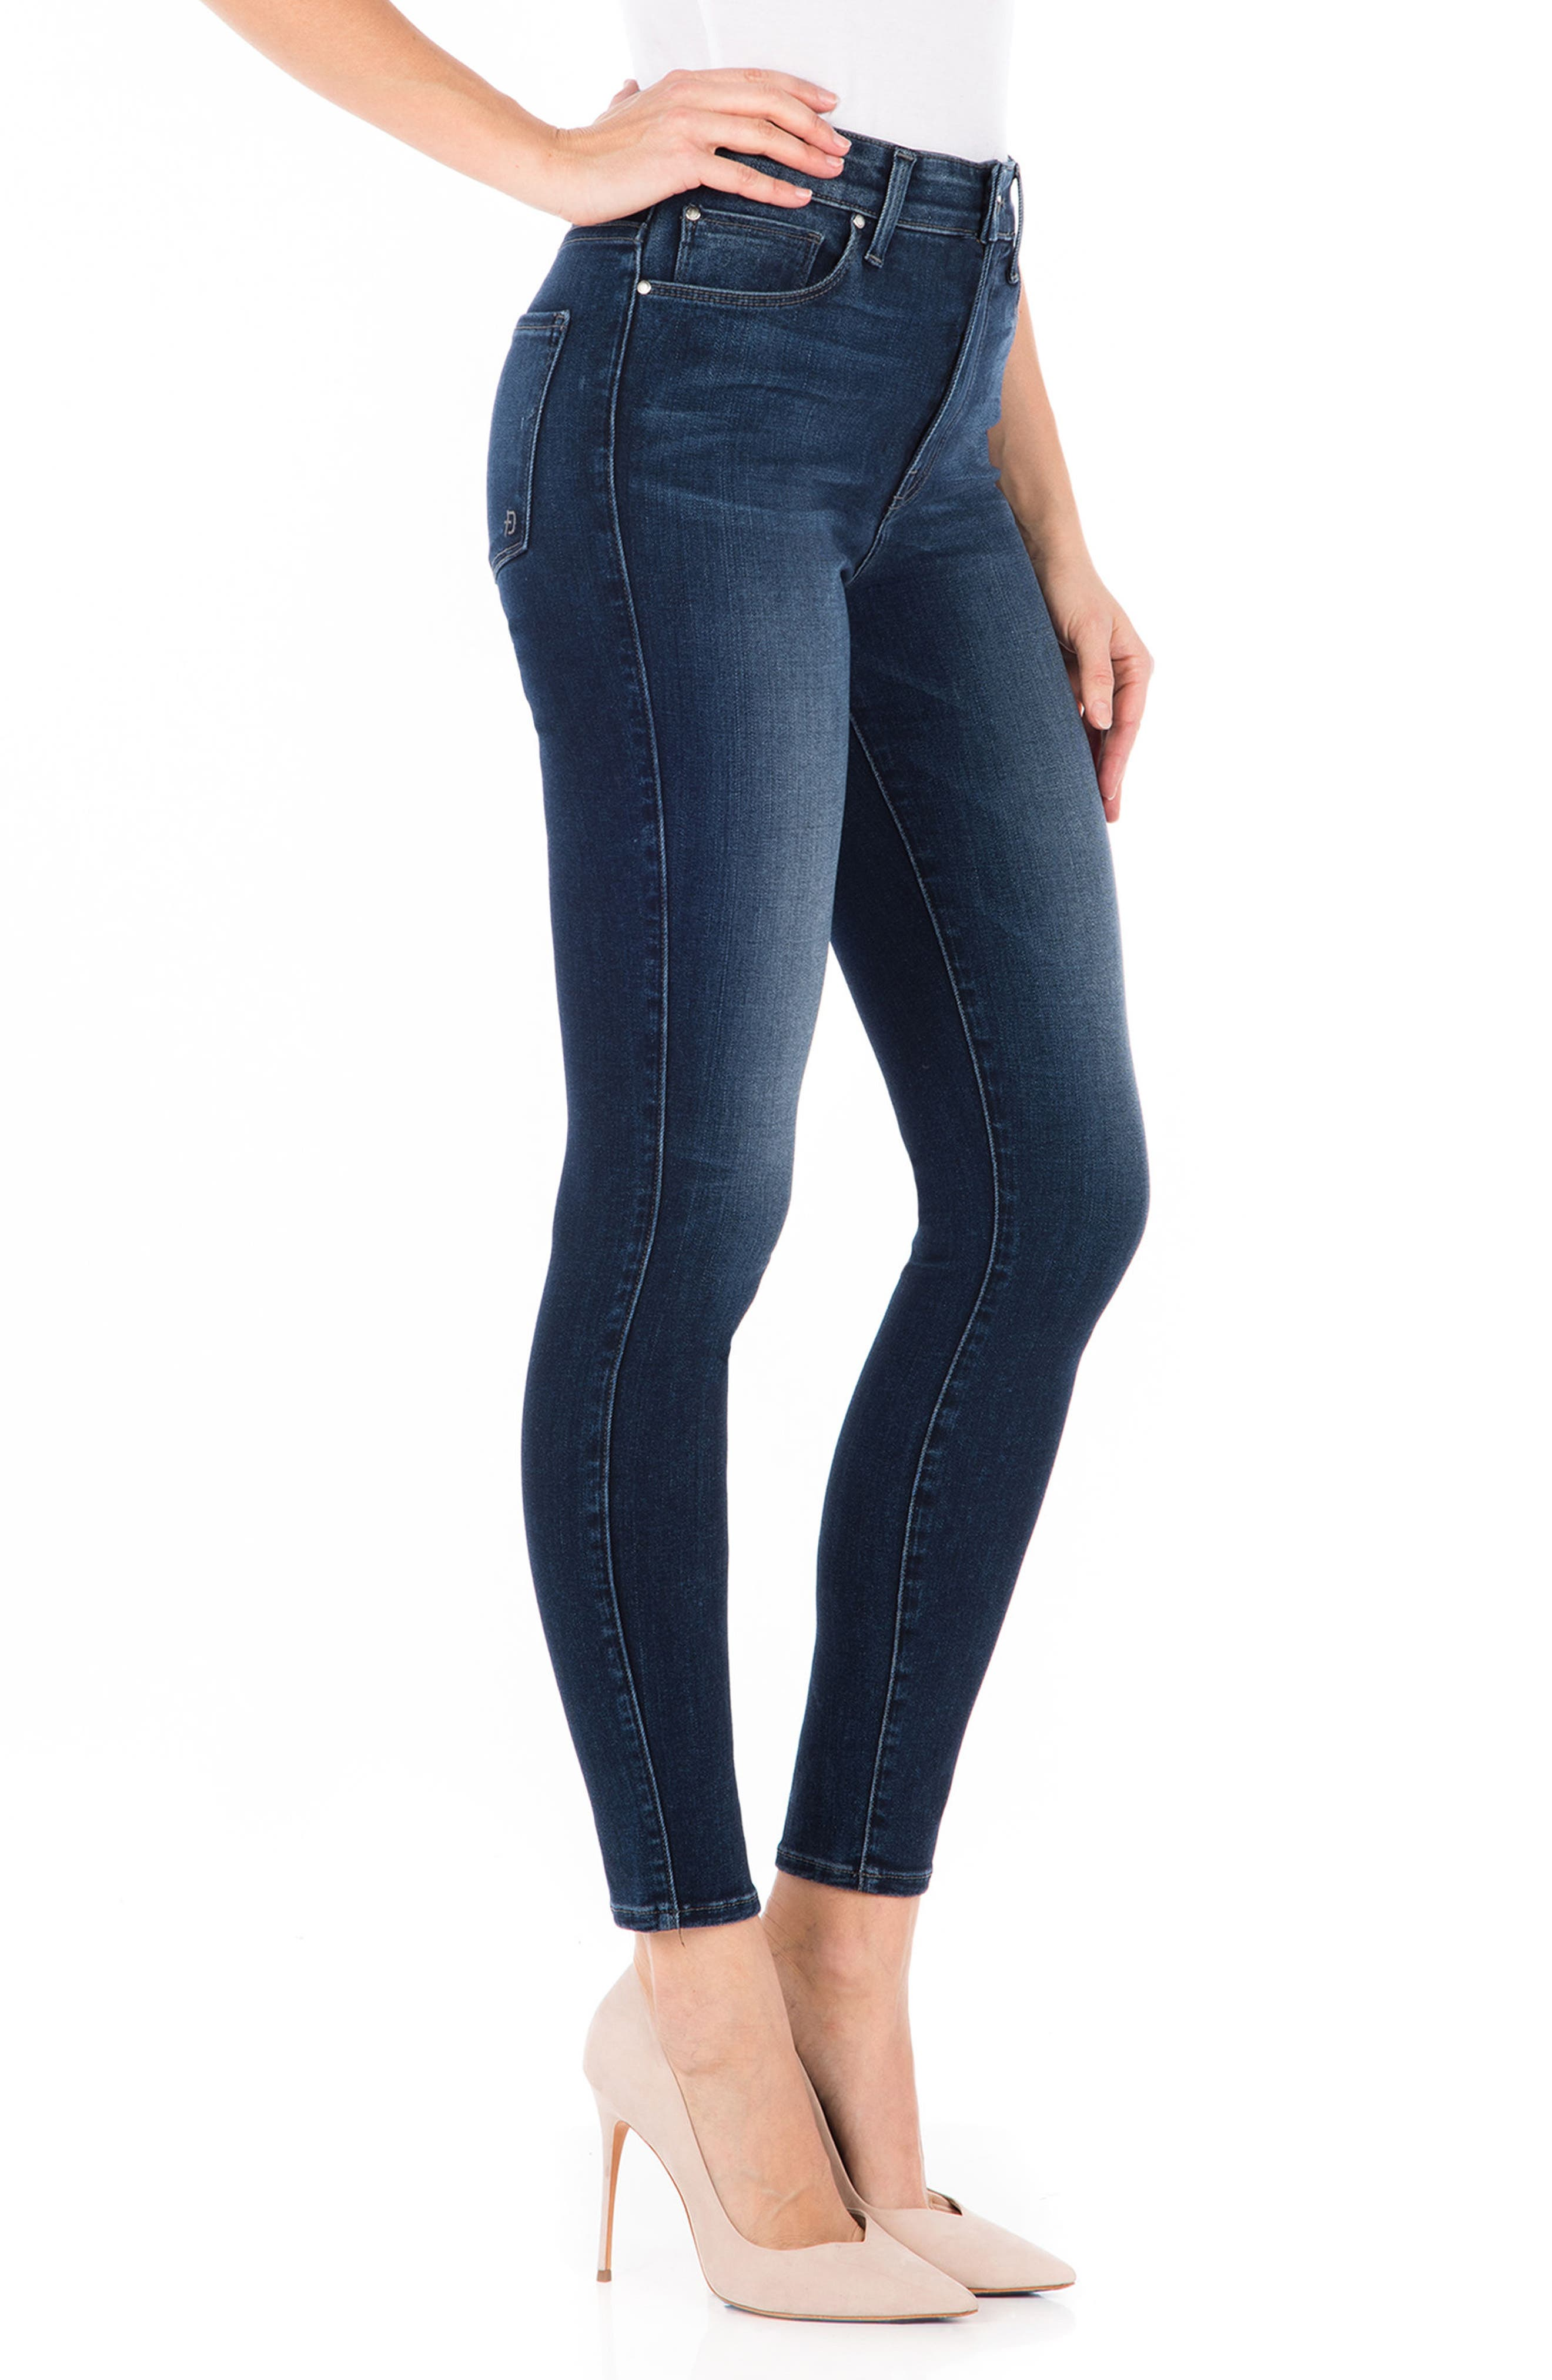 Luna High Waist Skinny Jeans,                             Alternate thumbnail 3, color,                             Blue Suede